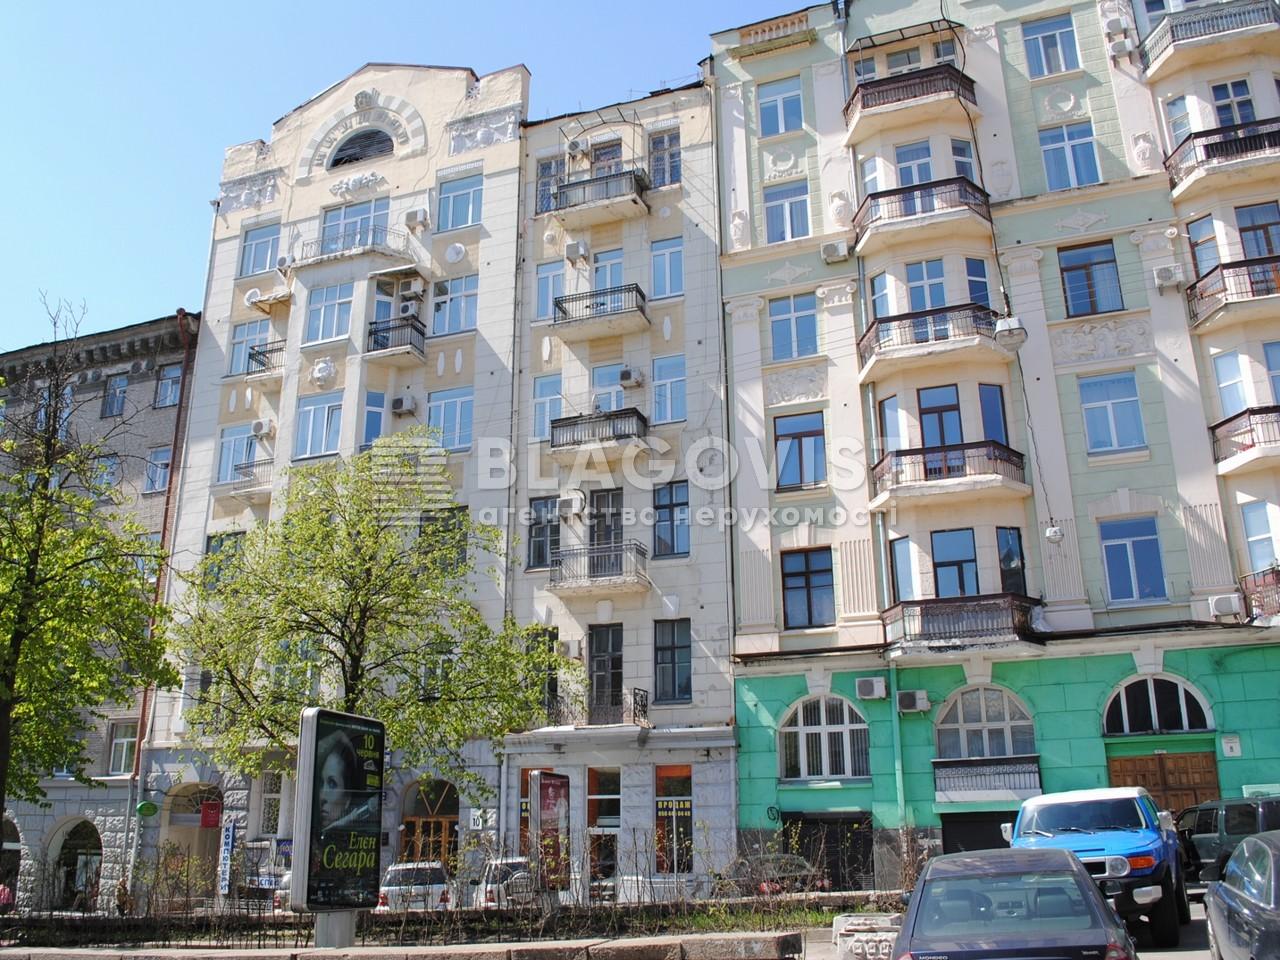 Квартира E-14530, Антоновича (Горького), 10, Киев - Фото 2